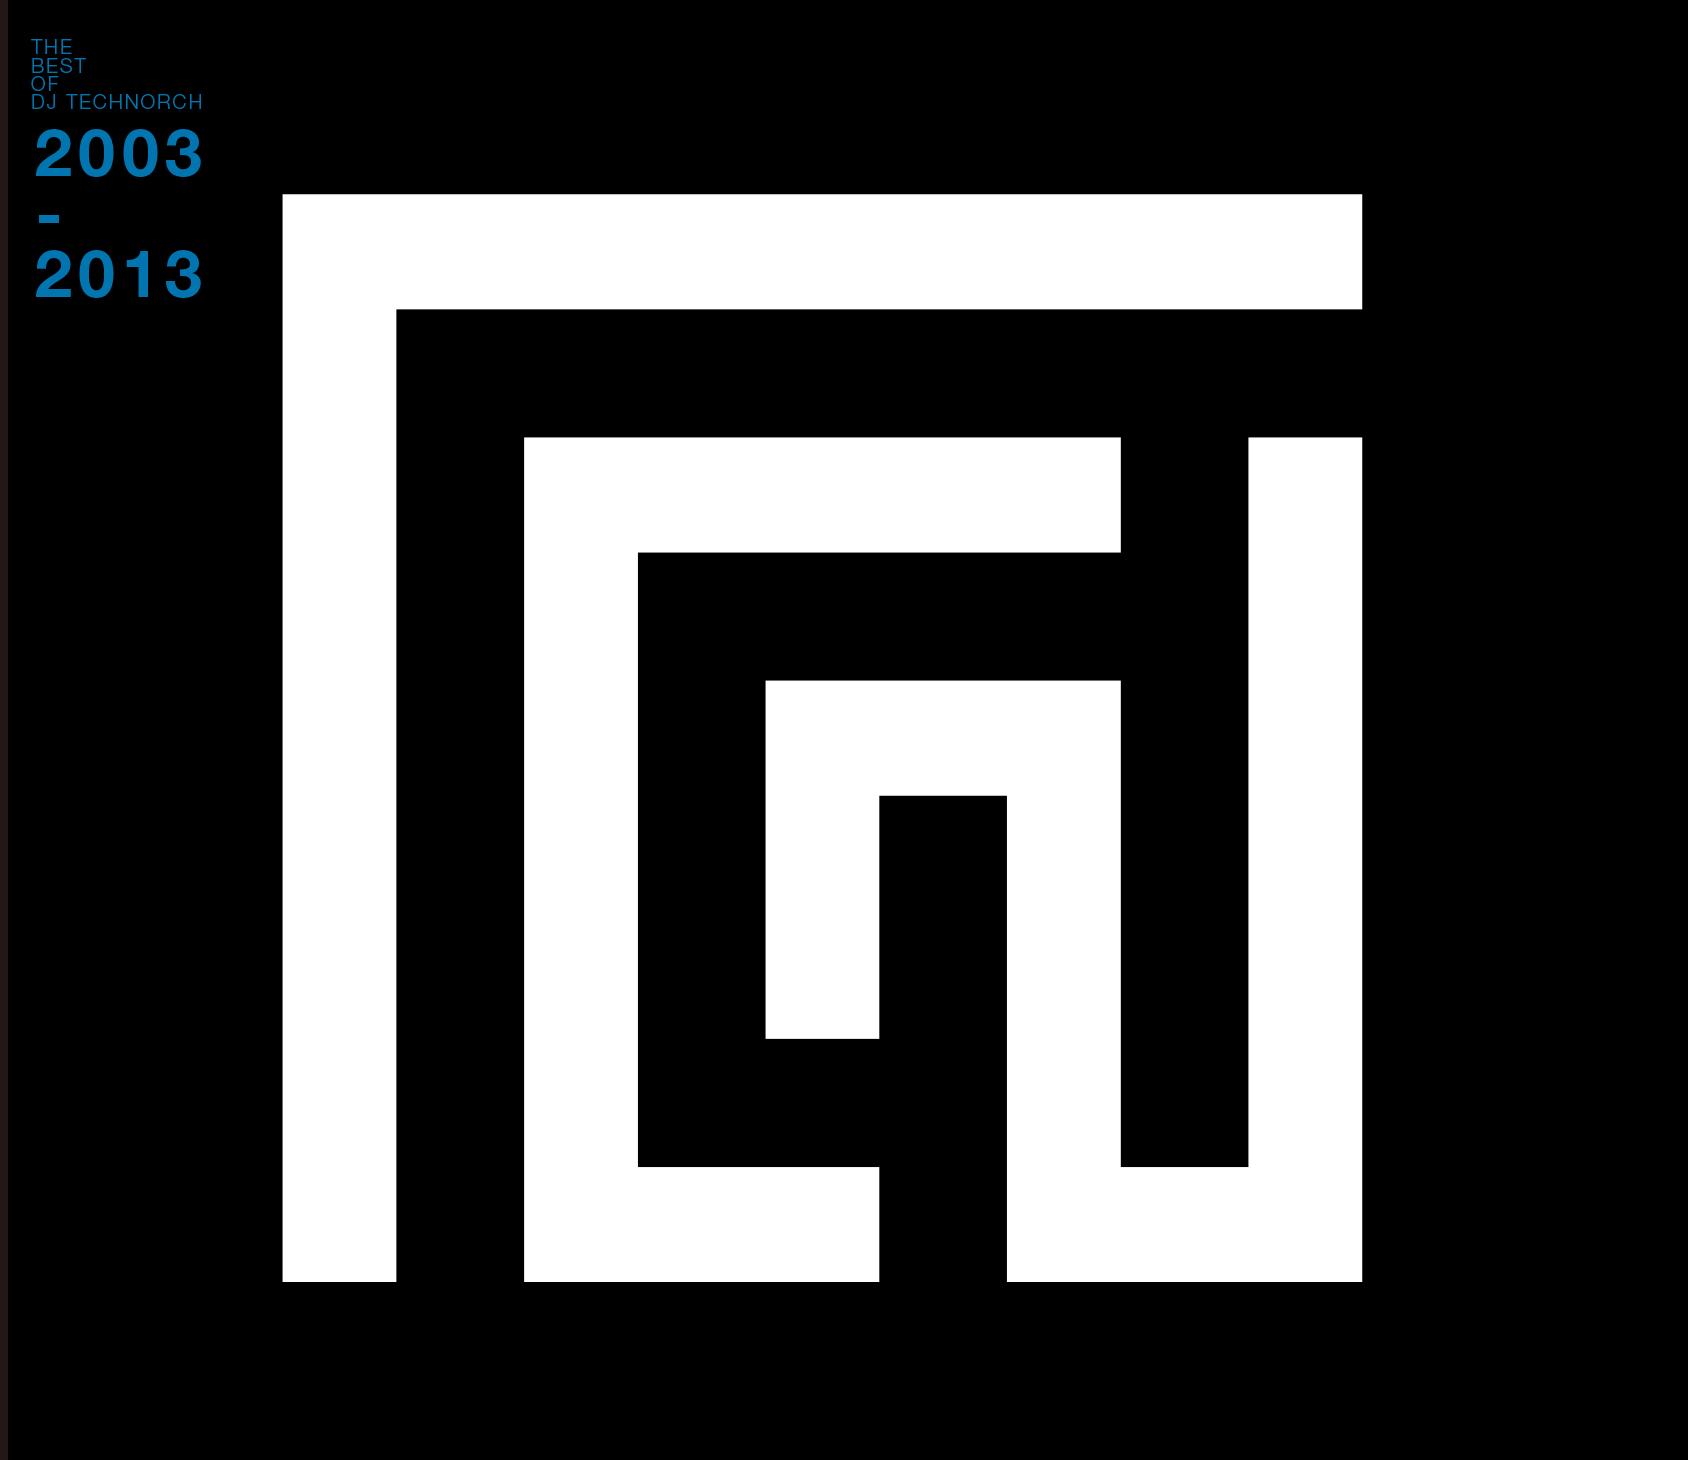 DJ TECHNORCH / THE BEST OF DJ TECHNORCH 2003-2013